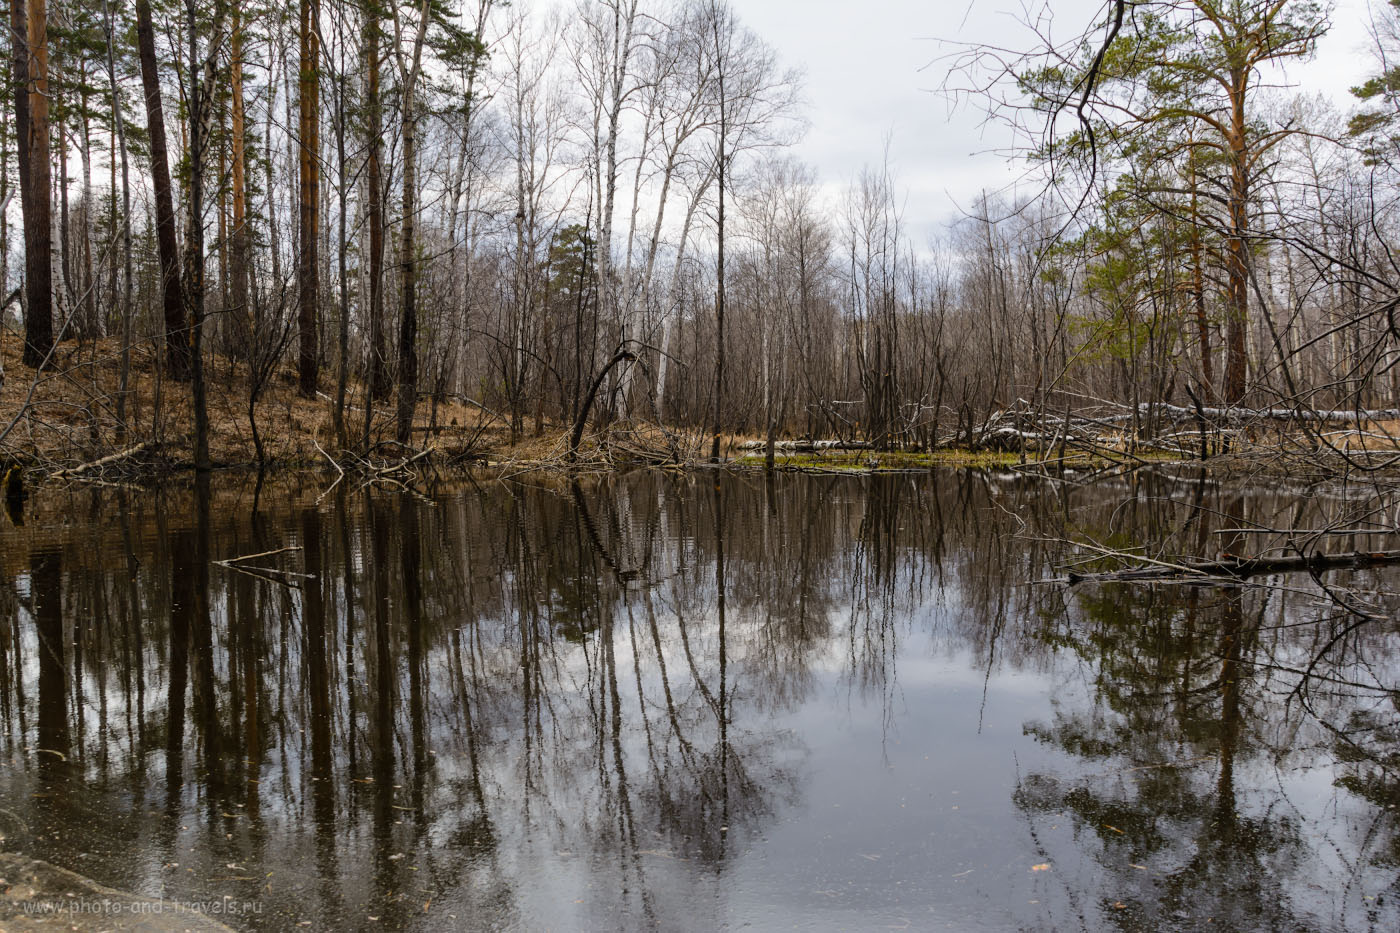 Фото 8. Съемка пейзажа на тревел-зум Сигма 18-200 и зеркалку Никон Д5200 без смаза. 1/200, -0.67, 9.0, 100, 18.